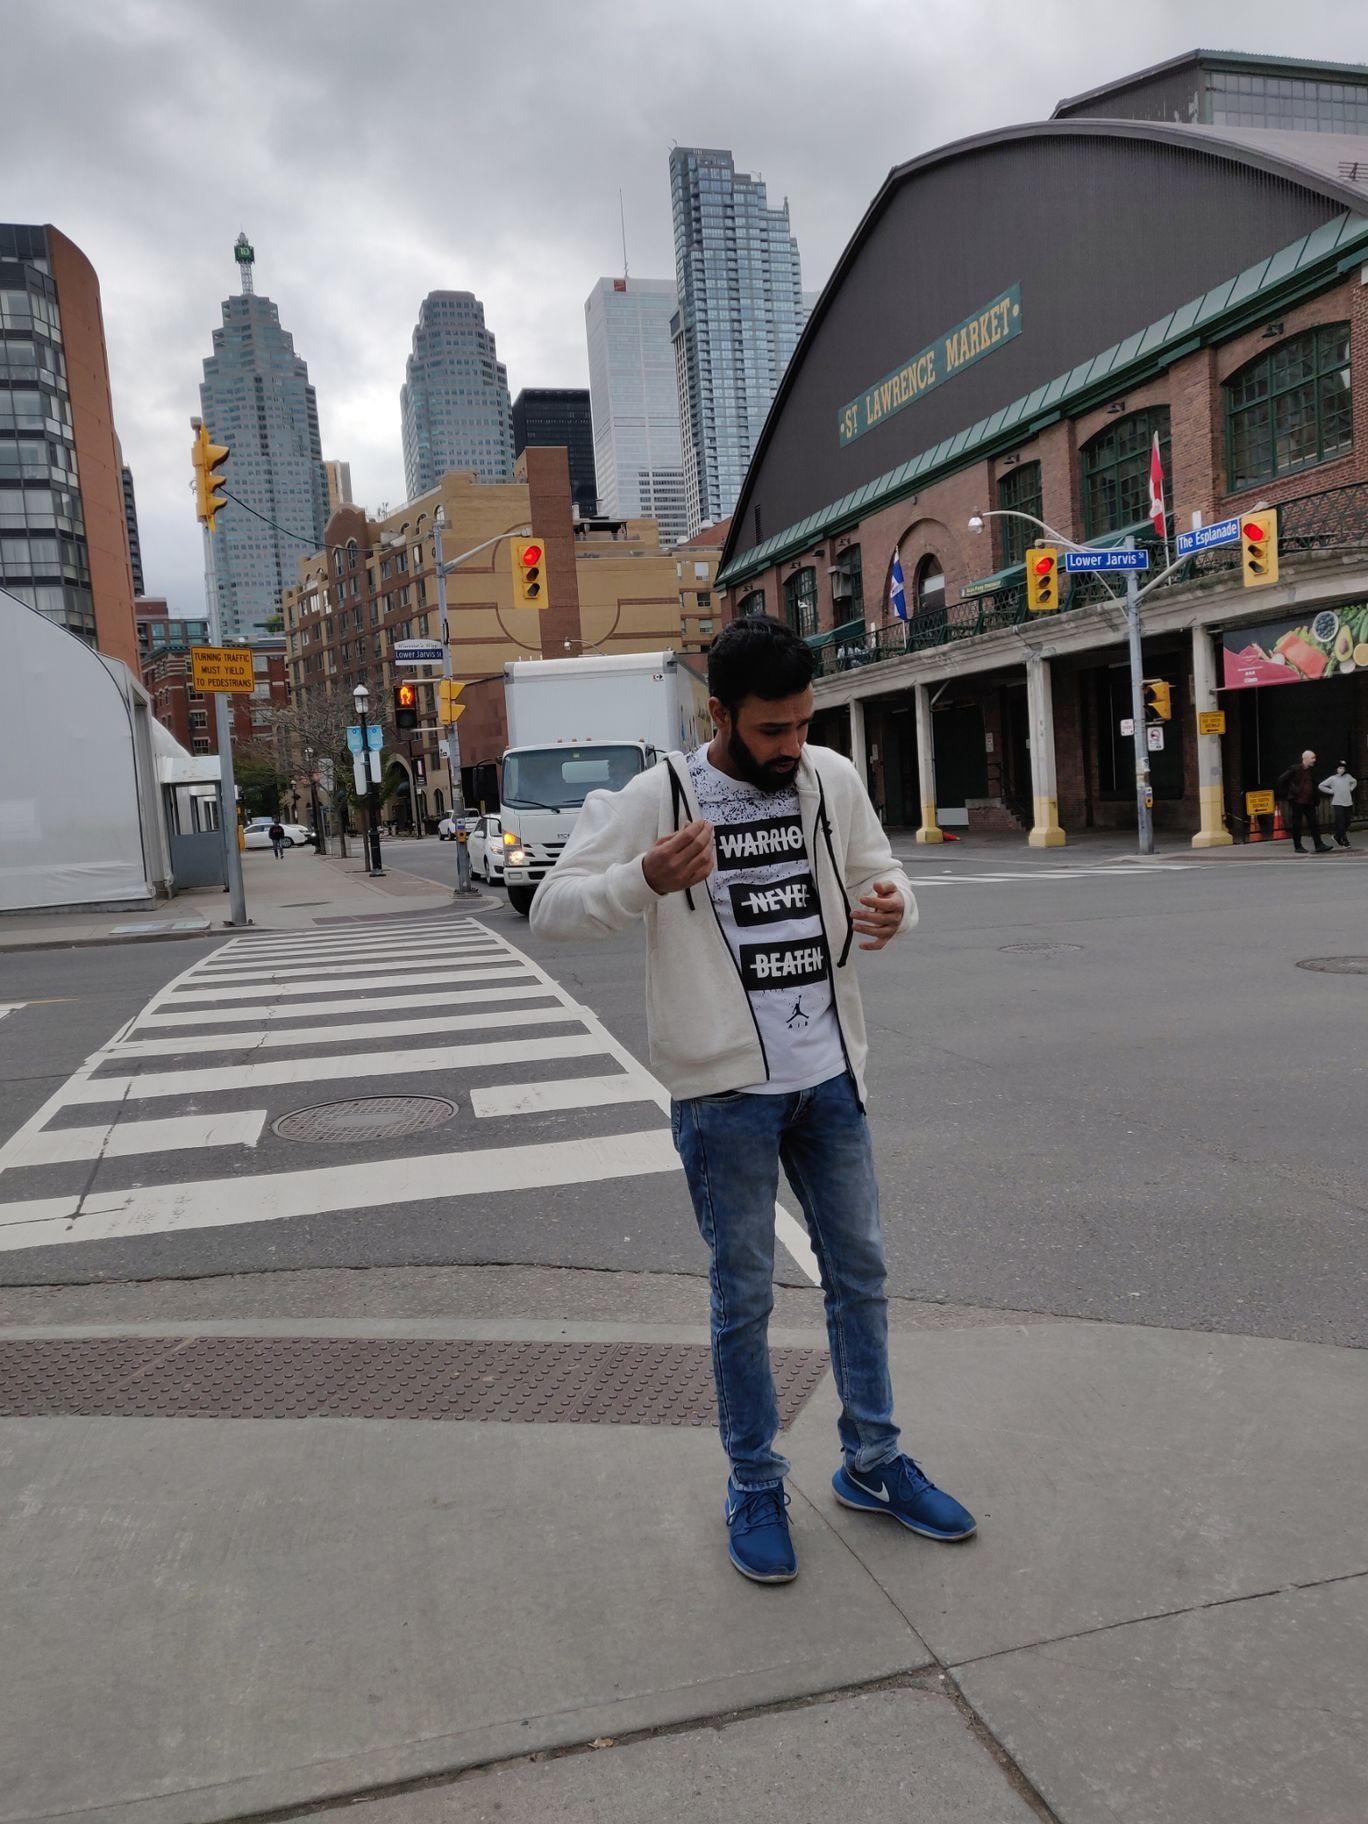 Photo of Toronto By Abhishek Singhal